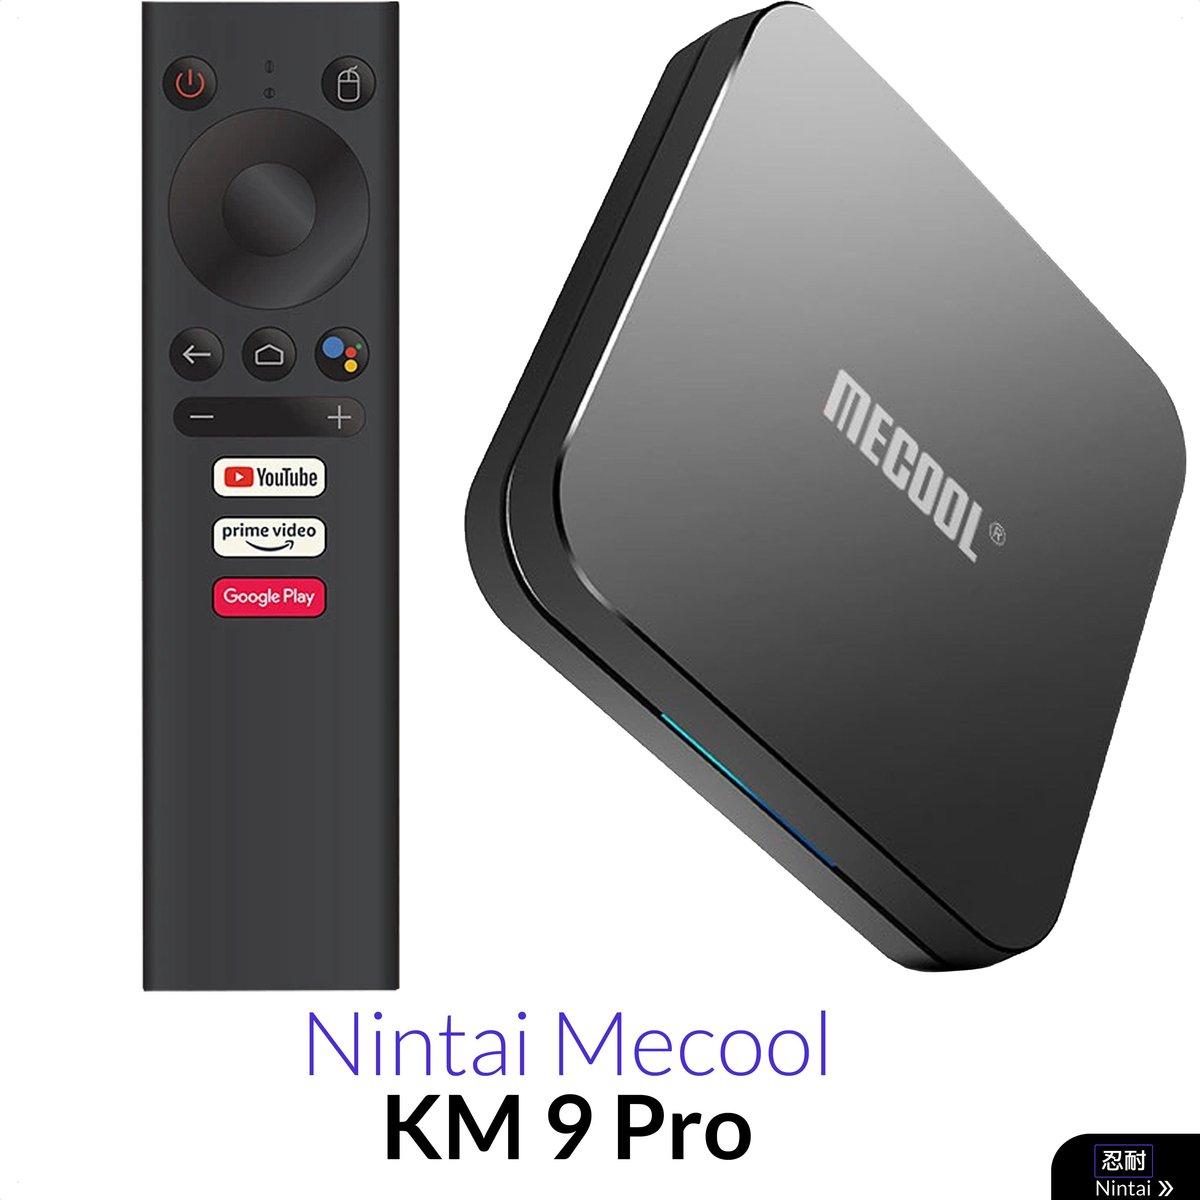 Android TV Box – Officiële Android 9.0  –  4K HDR – Ingebouwde Chromecast – Disney Plus – Amazon Prime – 2GB 16GB – Mediaspeler en Mediaplayer